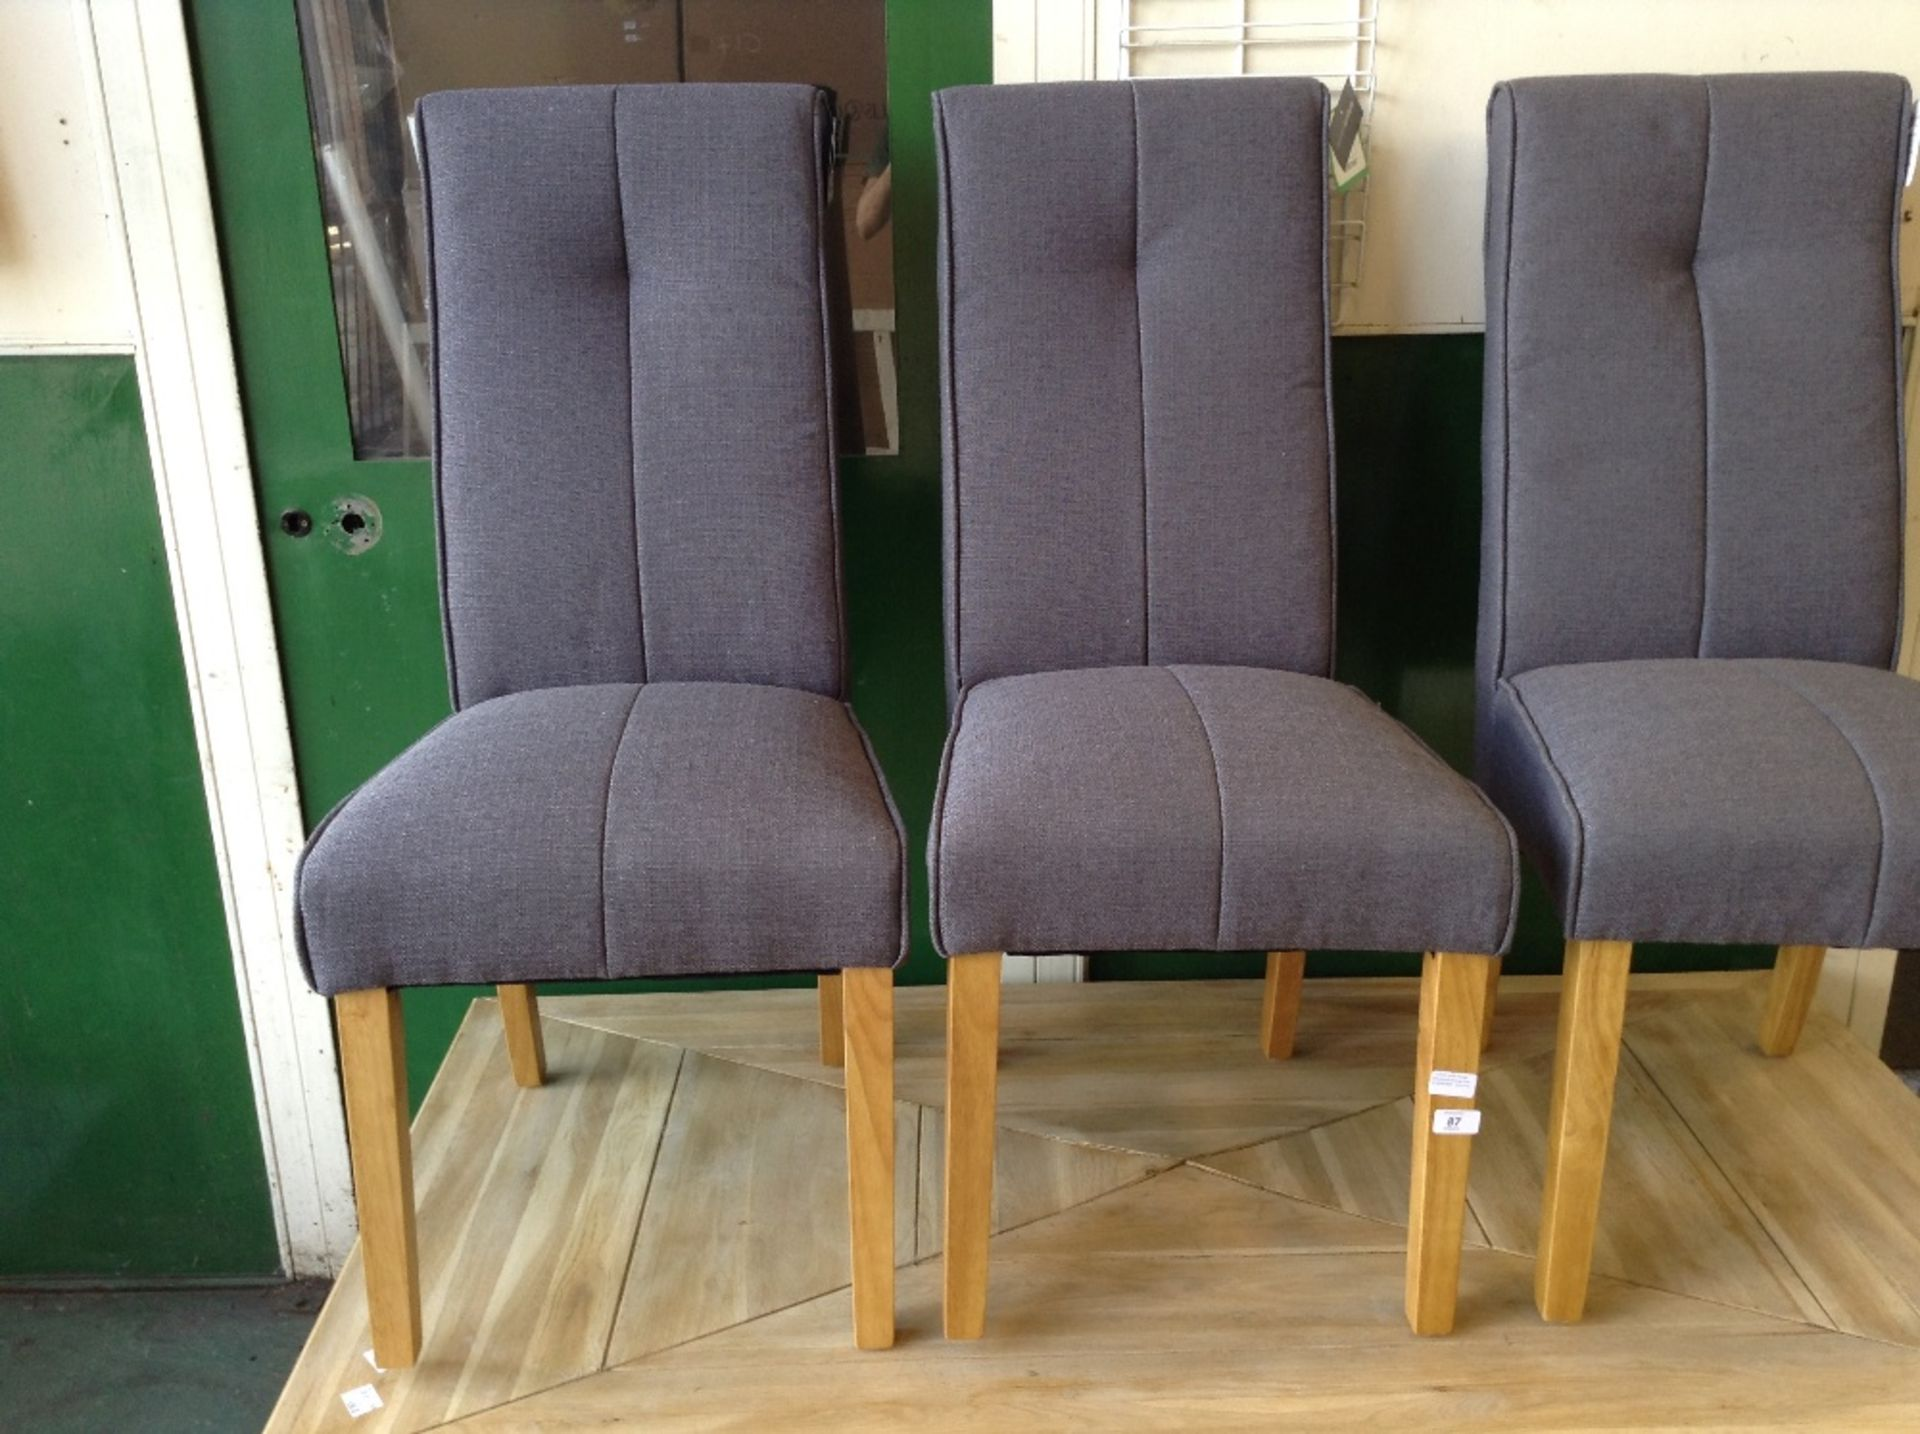 Lot 87 - All Home Denver Upholstered Dining Chair x2 (HVW7669 - 12213/4)